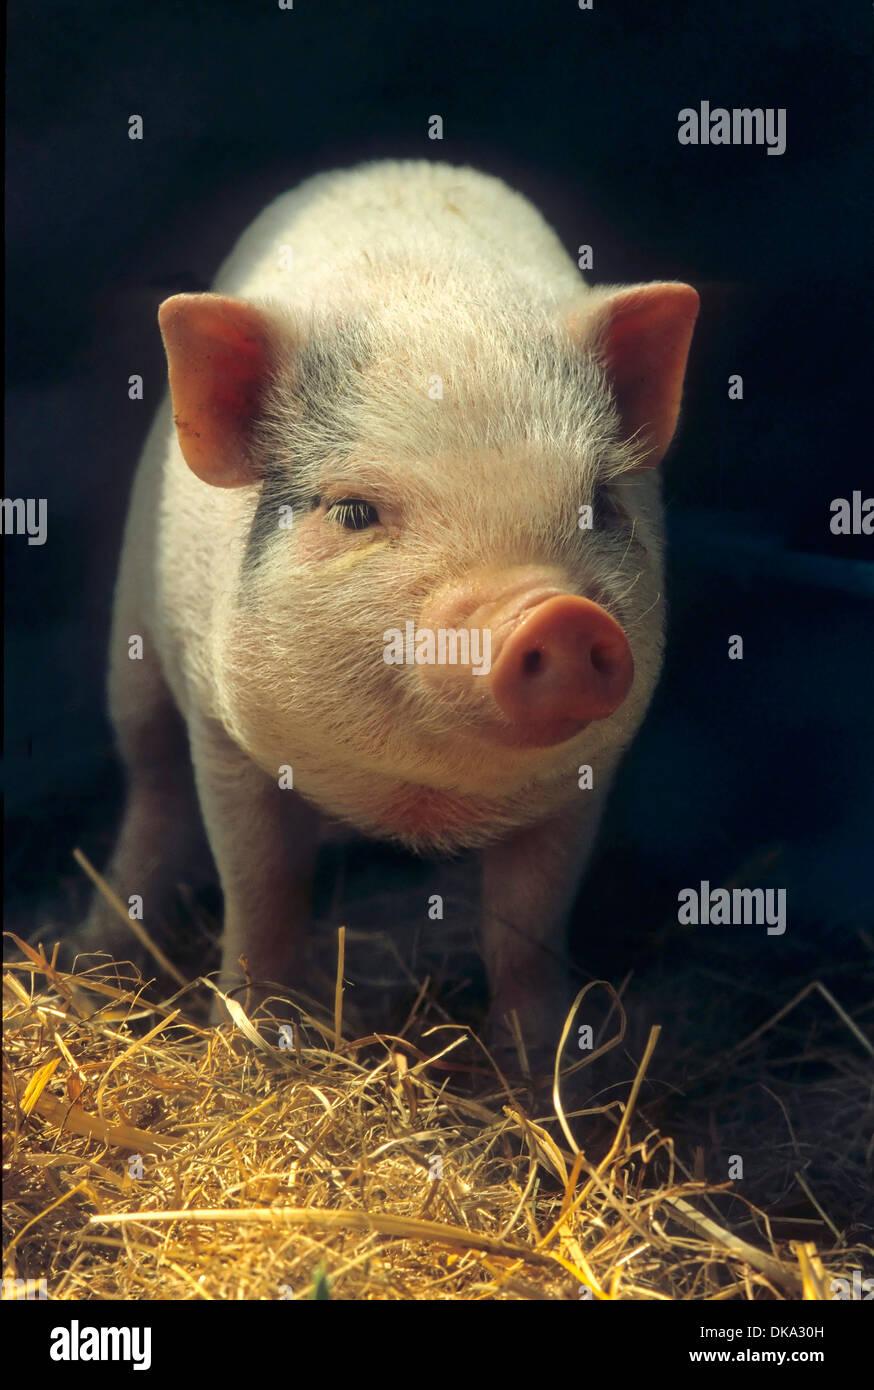 Hausschwein (Sus scrofa domestica), domestic pig (Sus scrofa domesticus) Sus domesticus, swine, hog Stock Photo